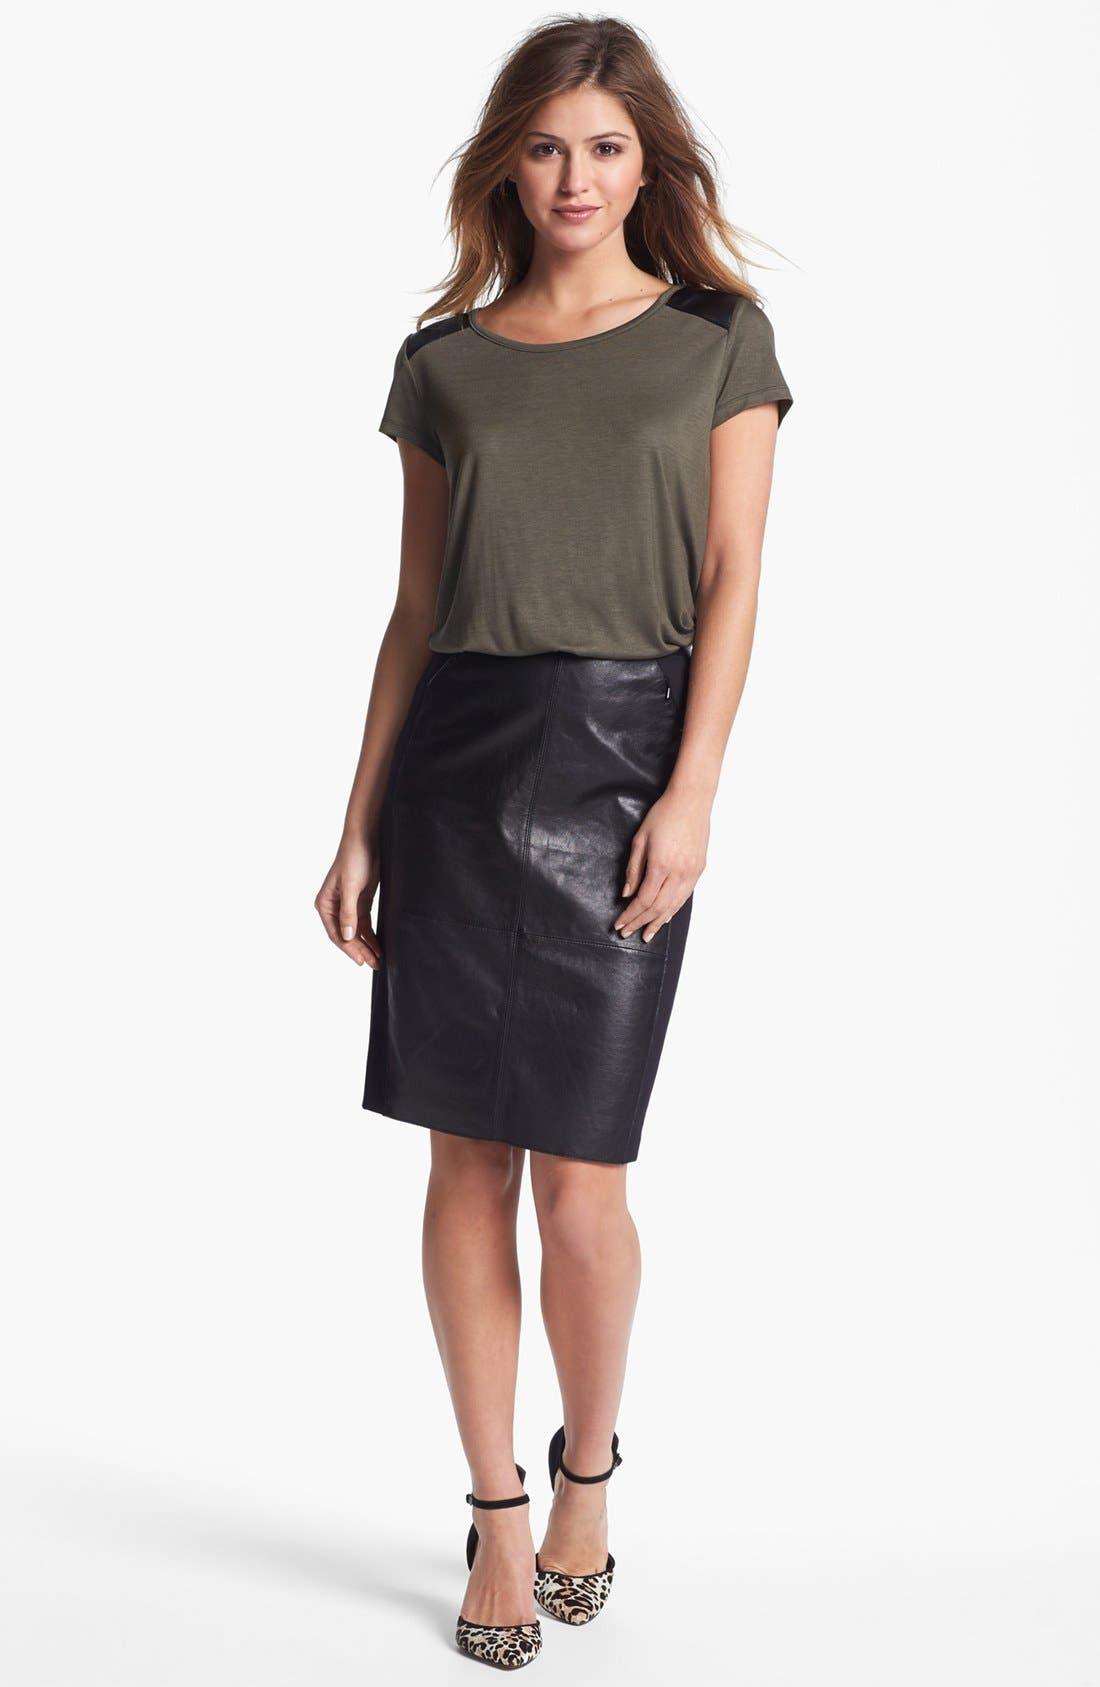 Alternate Image 1 Selected - Halogen® Tee & Pencil Skirt